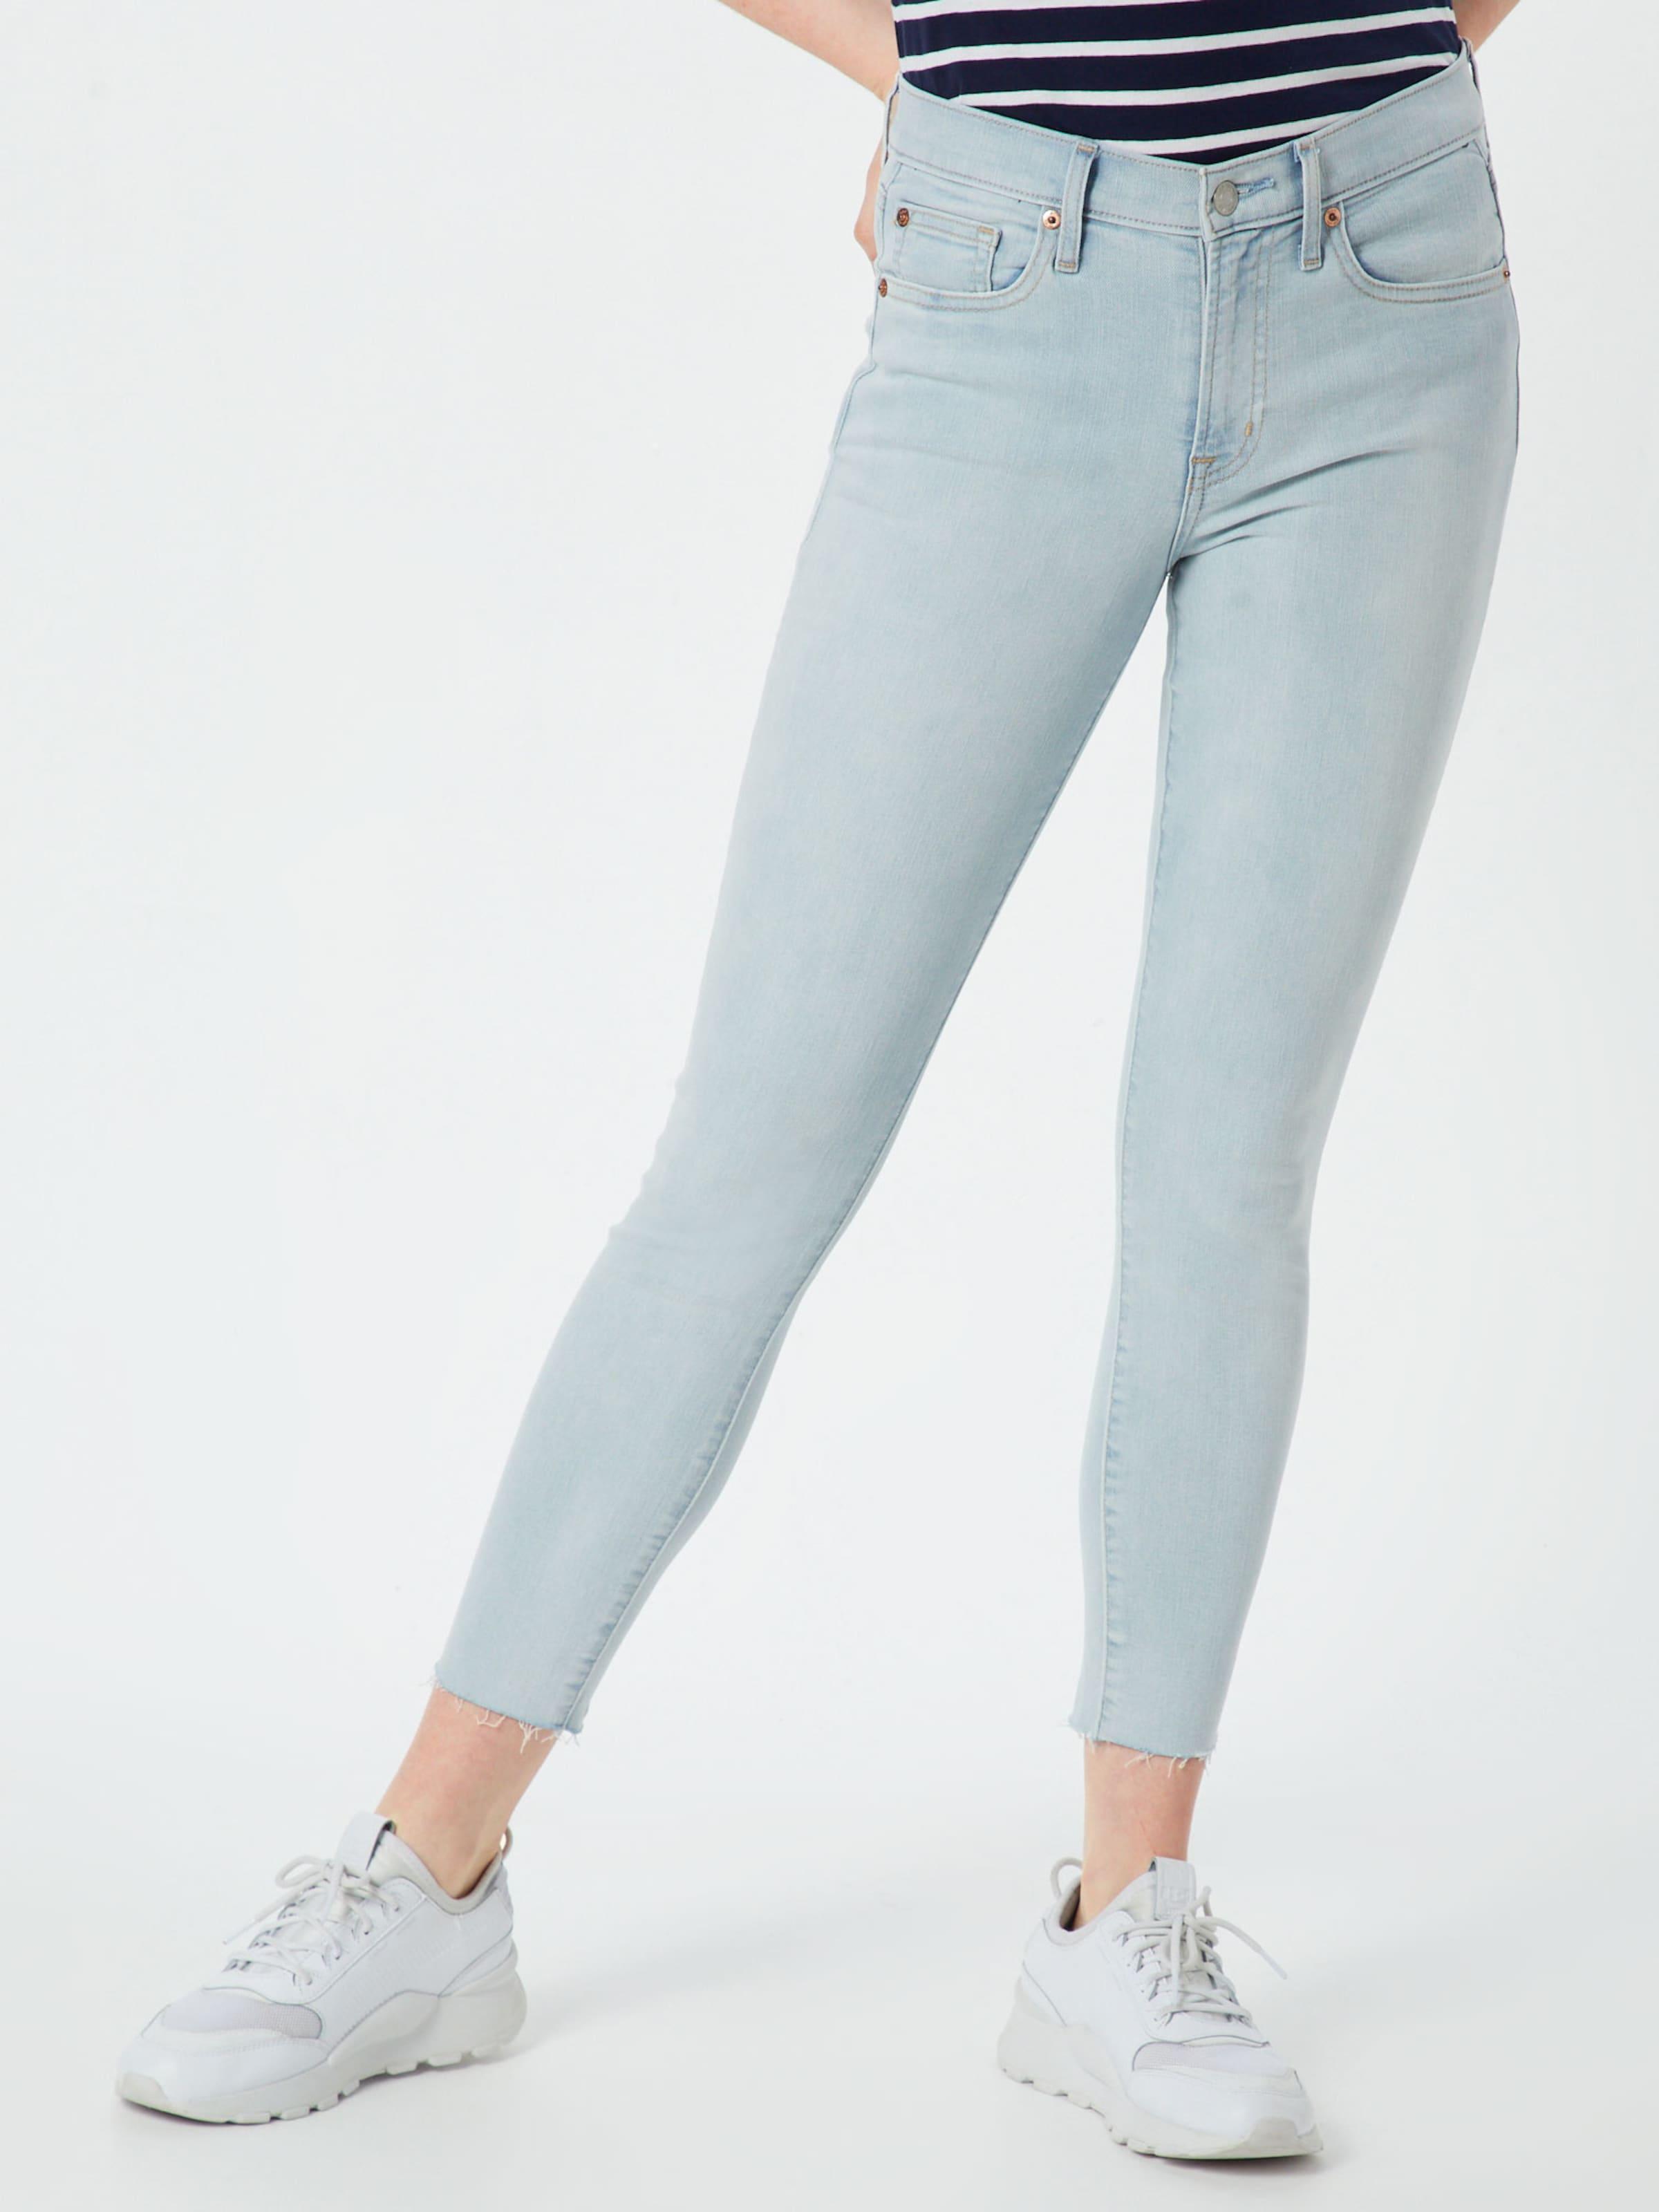 Gap Skinny En 'tr Ankle DenimClair Bleach Bleu Rh' Jean Cloud hdxBsCtQr